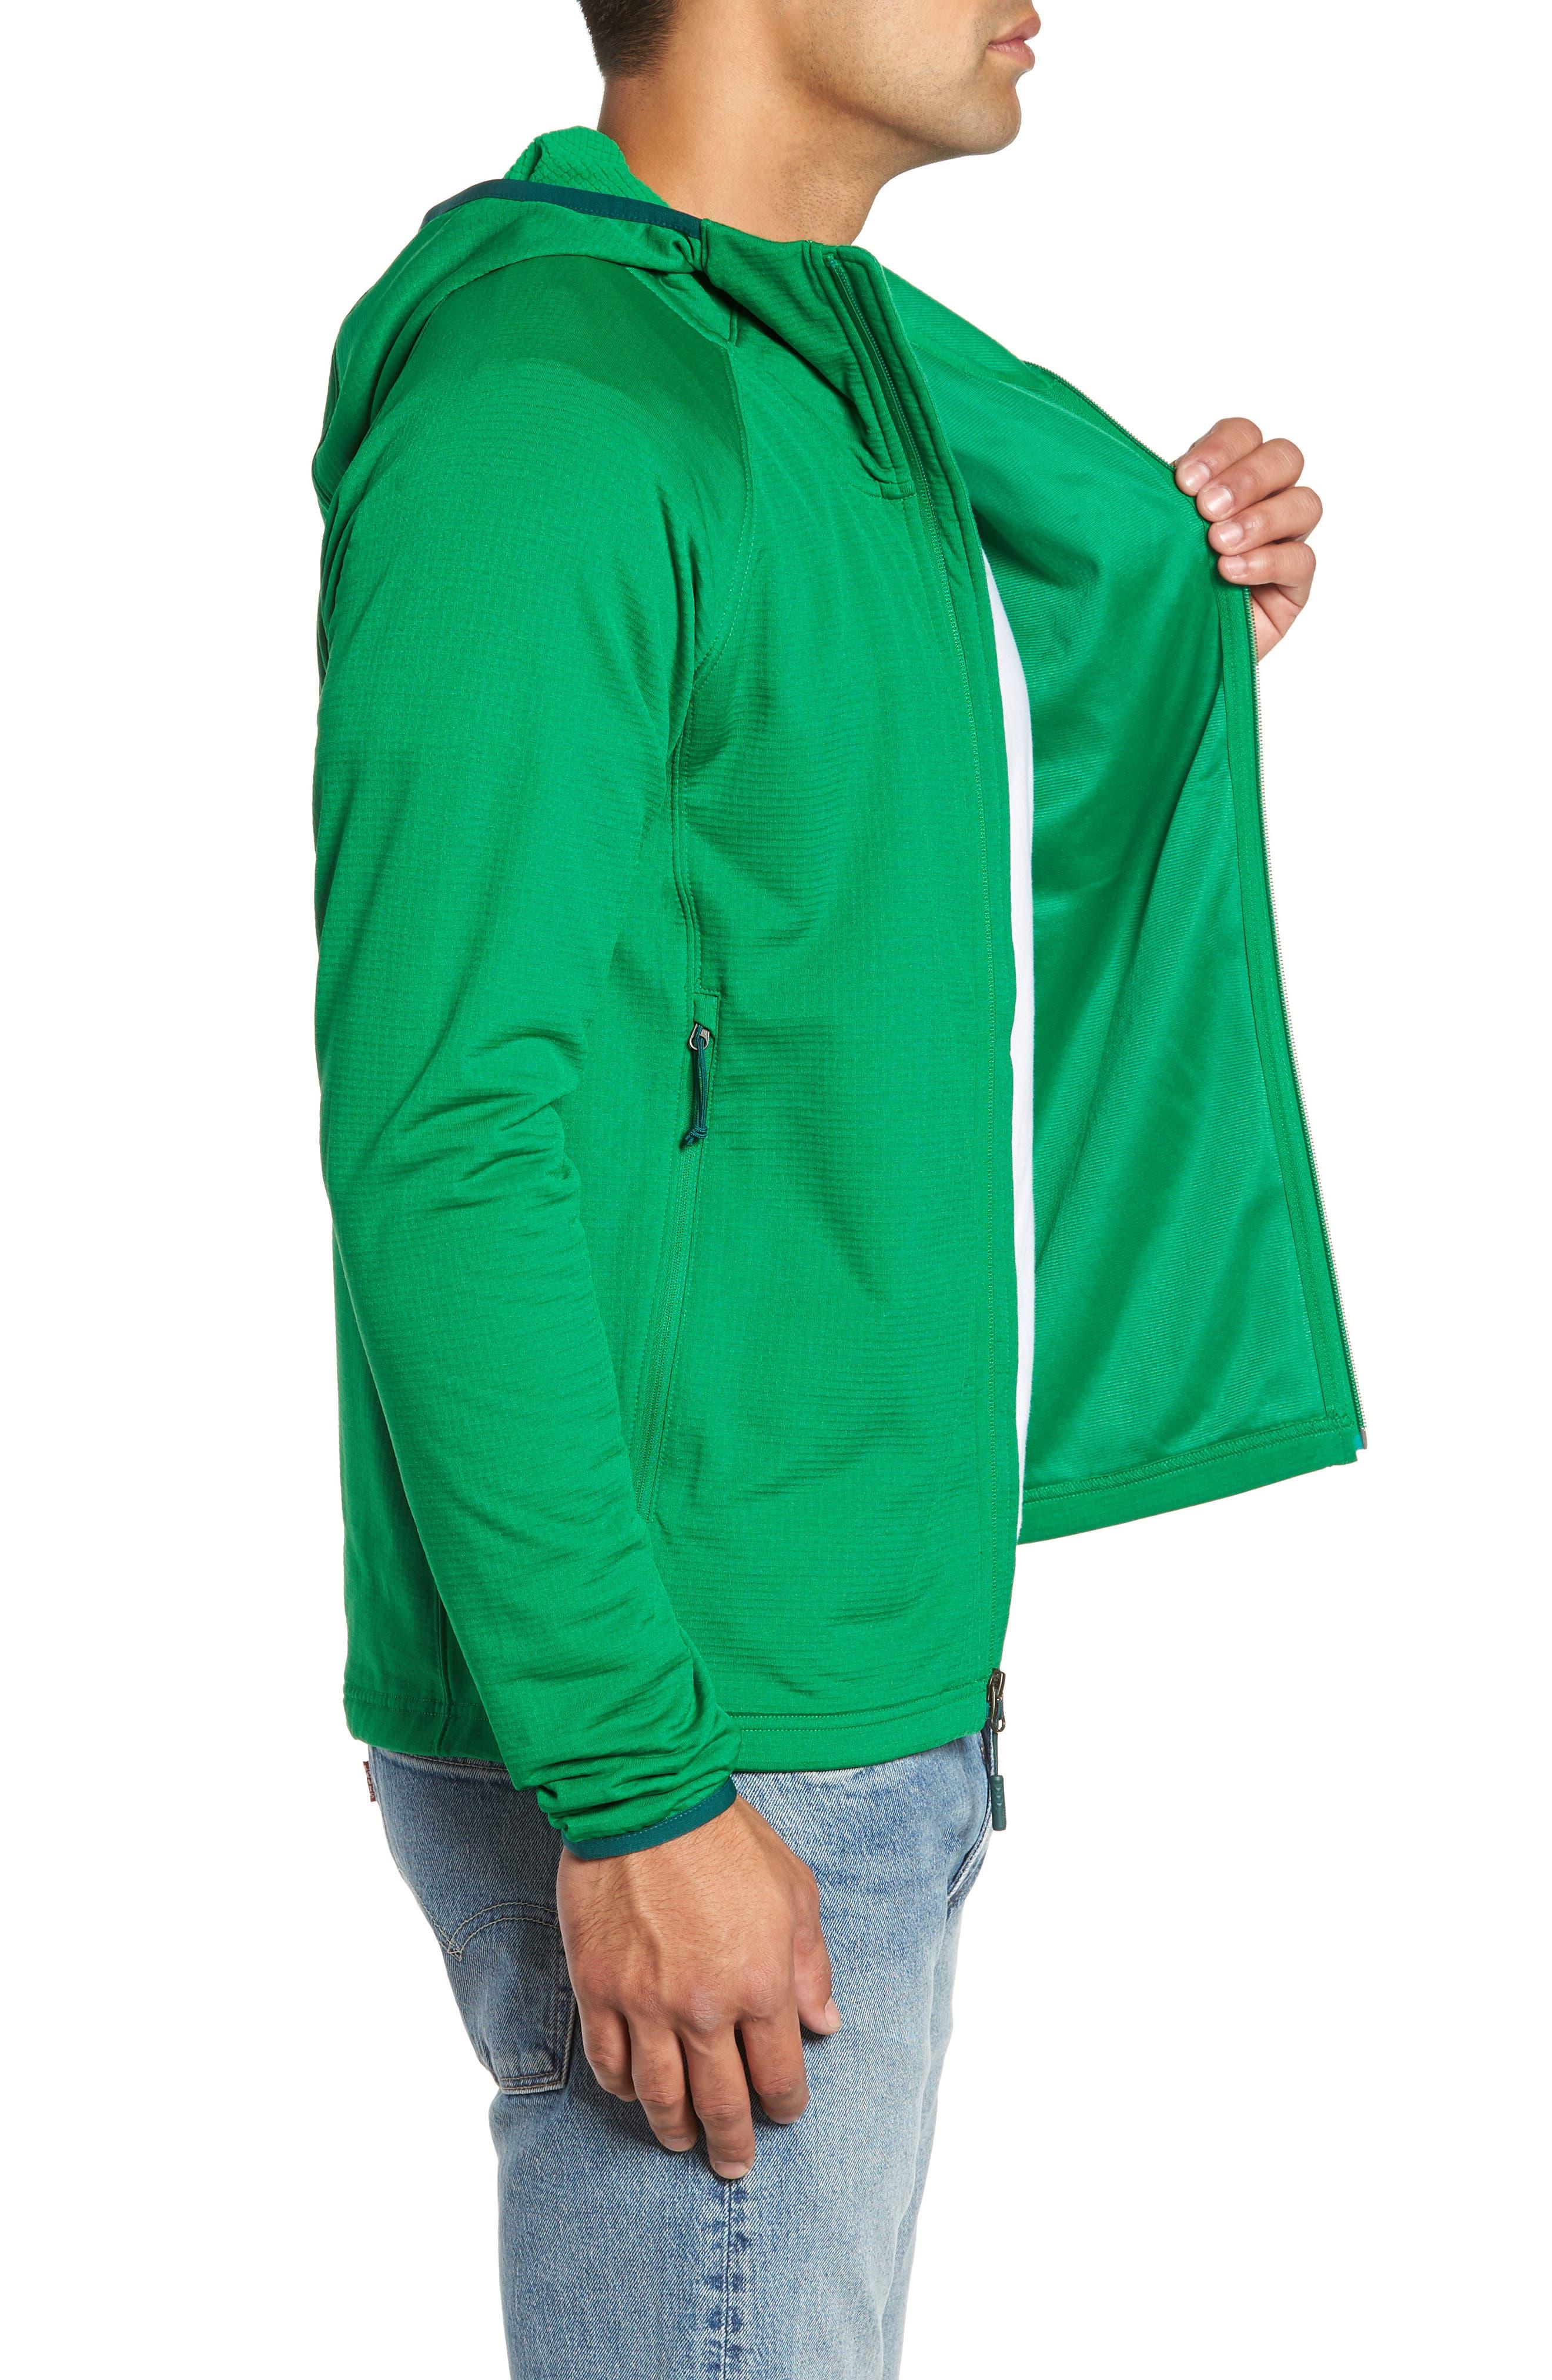 Borod Zip Fleece Jacket,                             Alternate thumbnail 3, color,                             PRIMARY GREEN/GARDEN GREEN